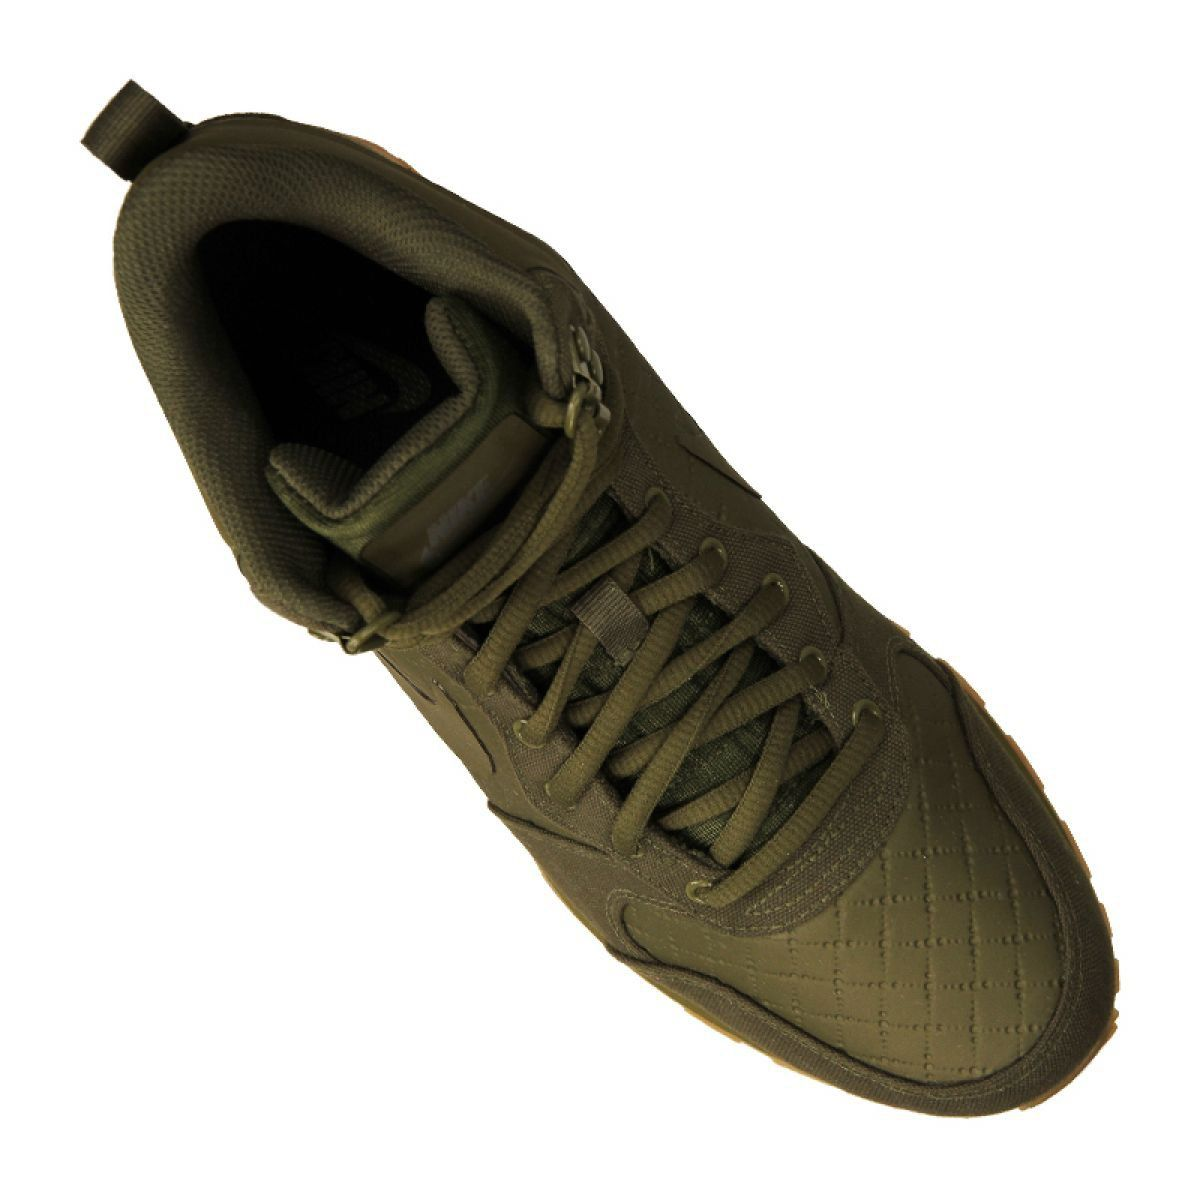 Buty Nike Md Runner Mid Prem M 844864 300 Zielone Mens Nike Shoes Nike Shoes